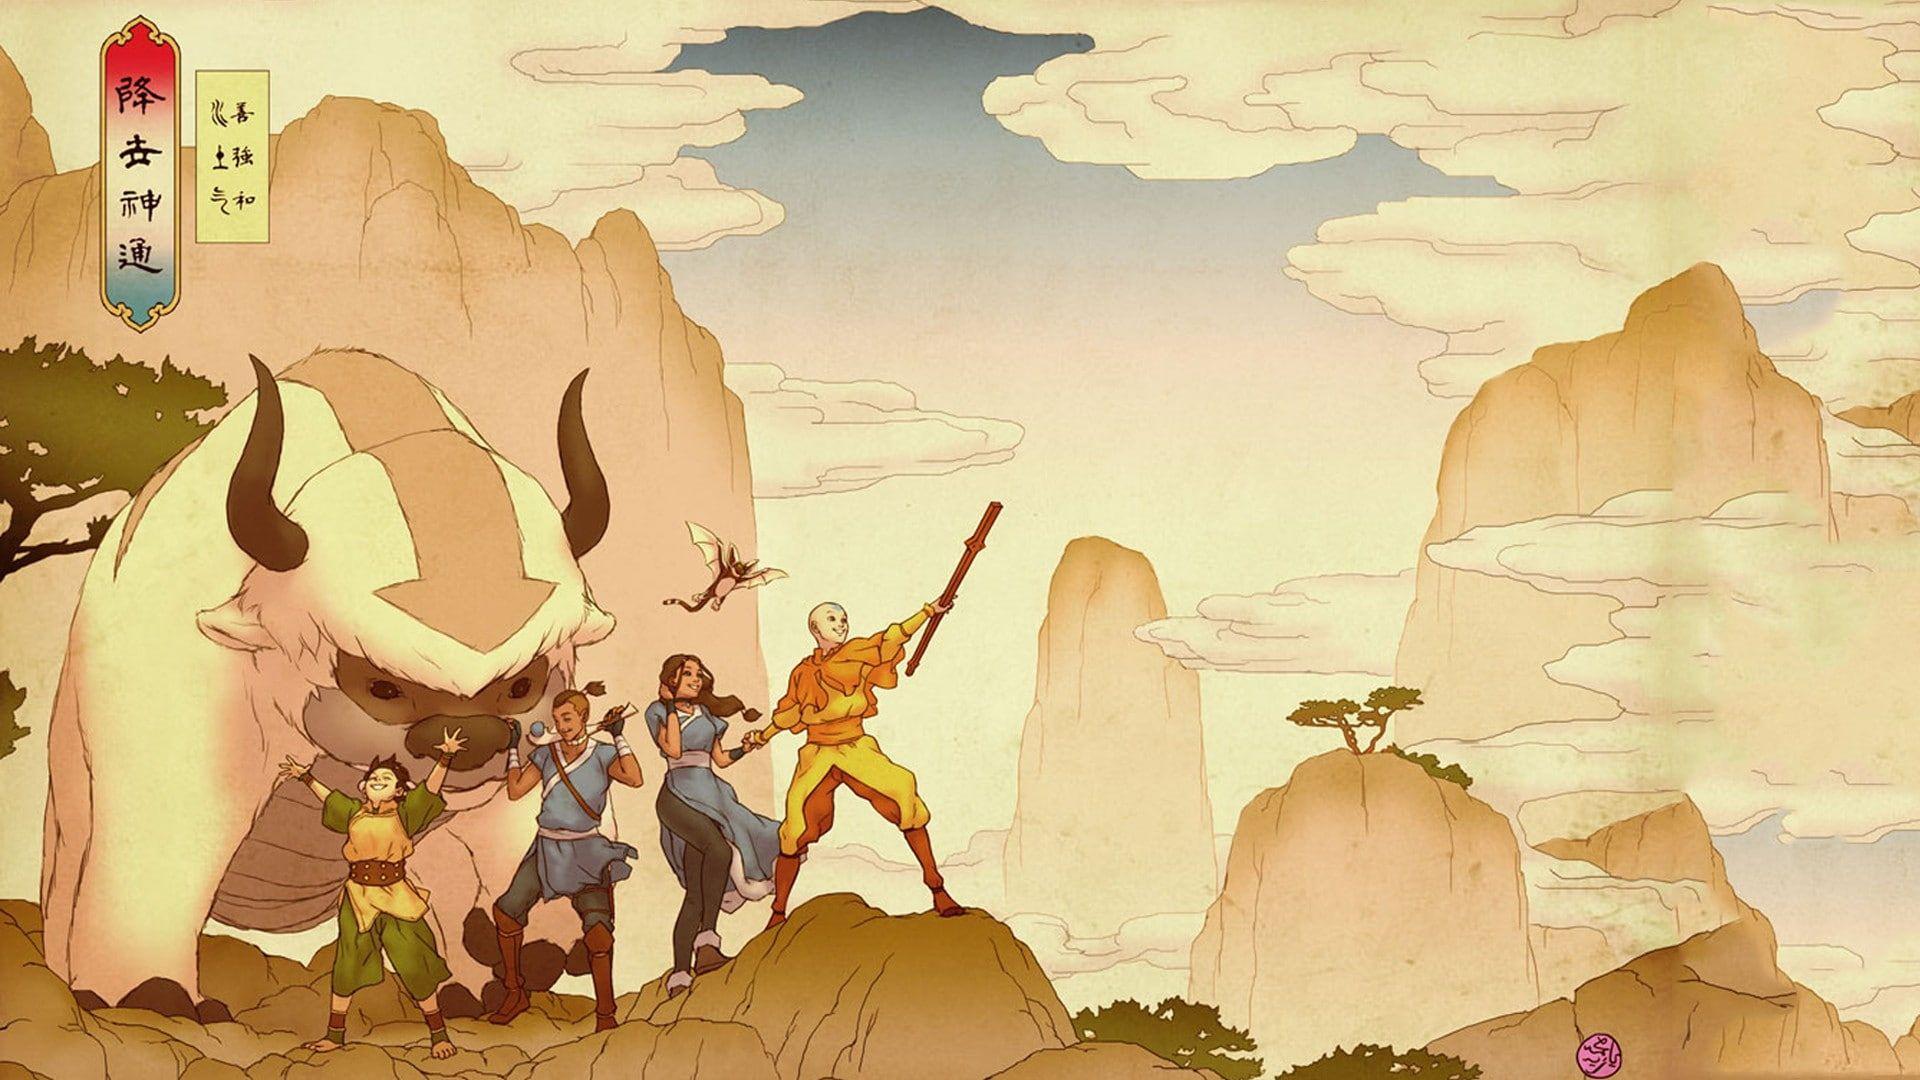 Avatar The Last Airbender 1080p Wallpaper Hdwallpaper Desktop In 2020 Avatar Airbender The Last Airbender Avatar Aang